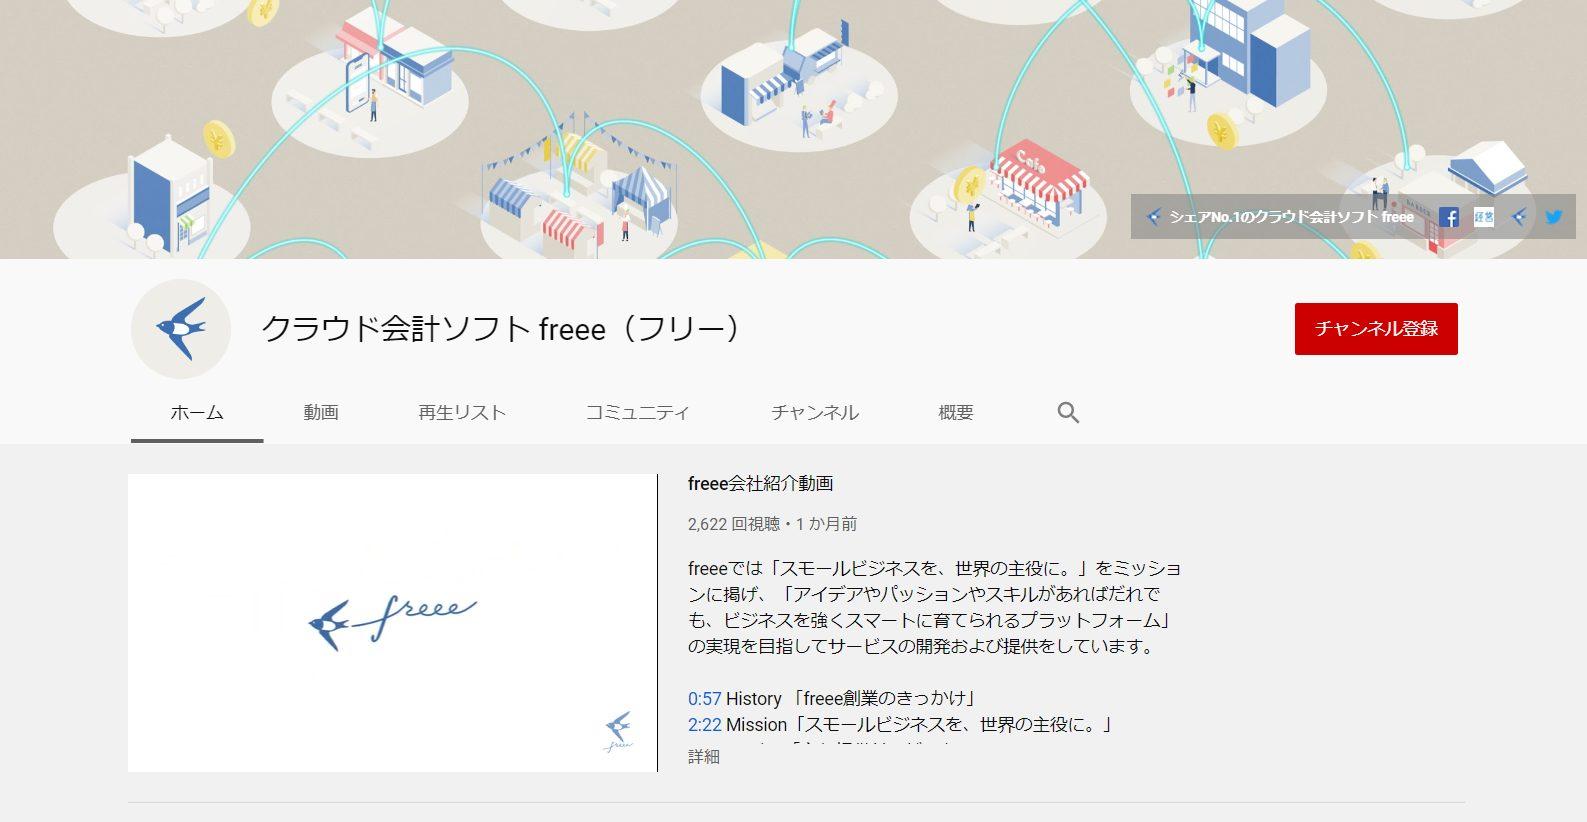 youtube-freee